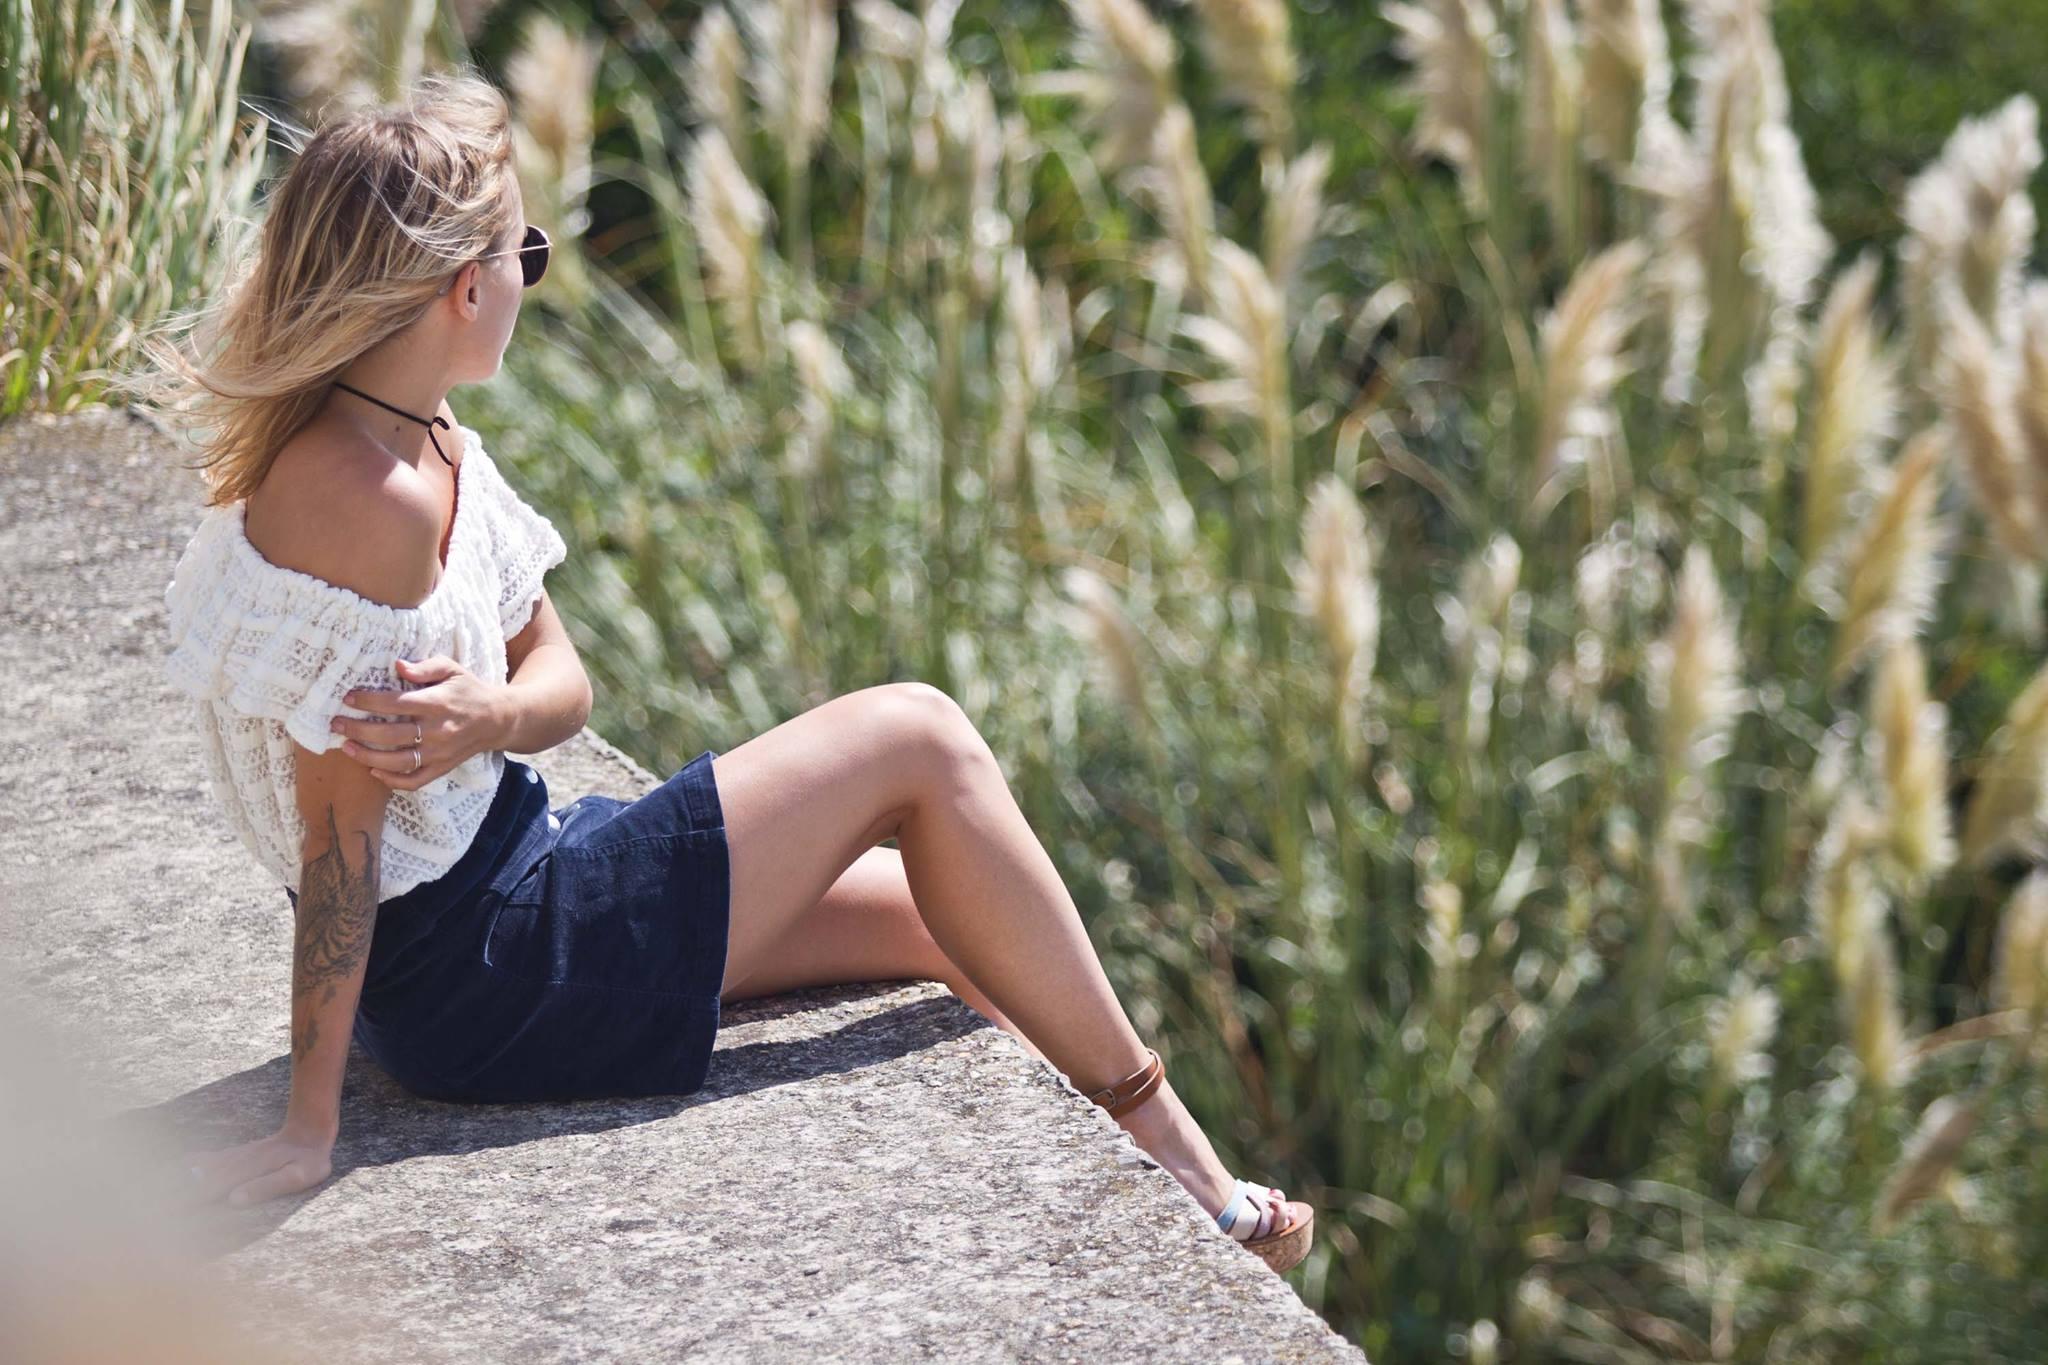 Top épaules dénudées jupe en velours et sandales Kjacques I Sp4nkblog 4